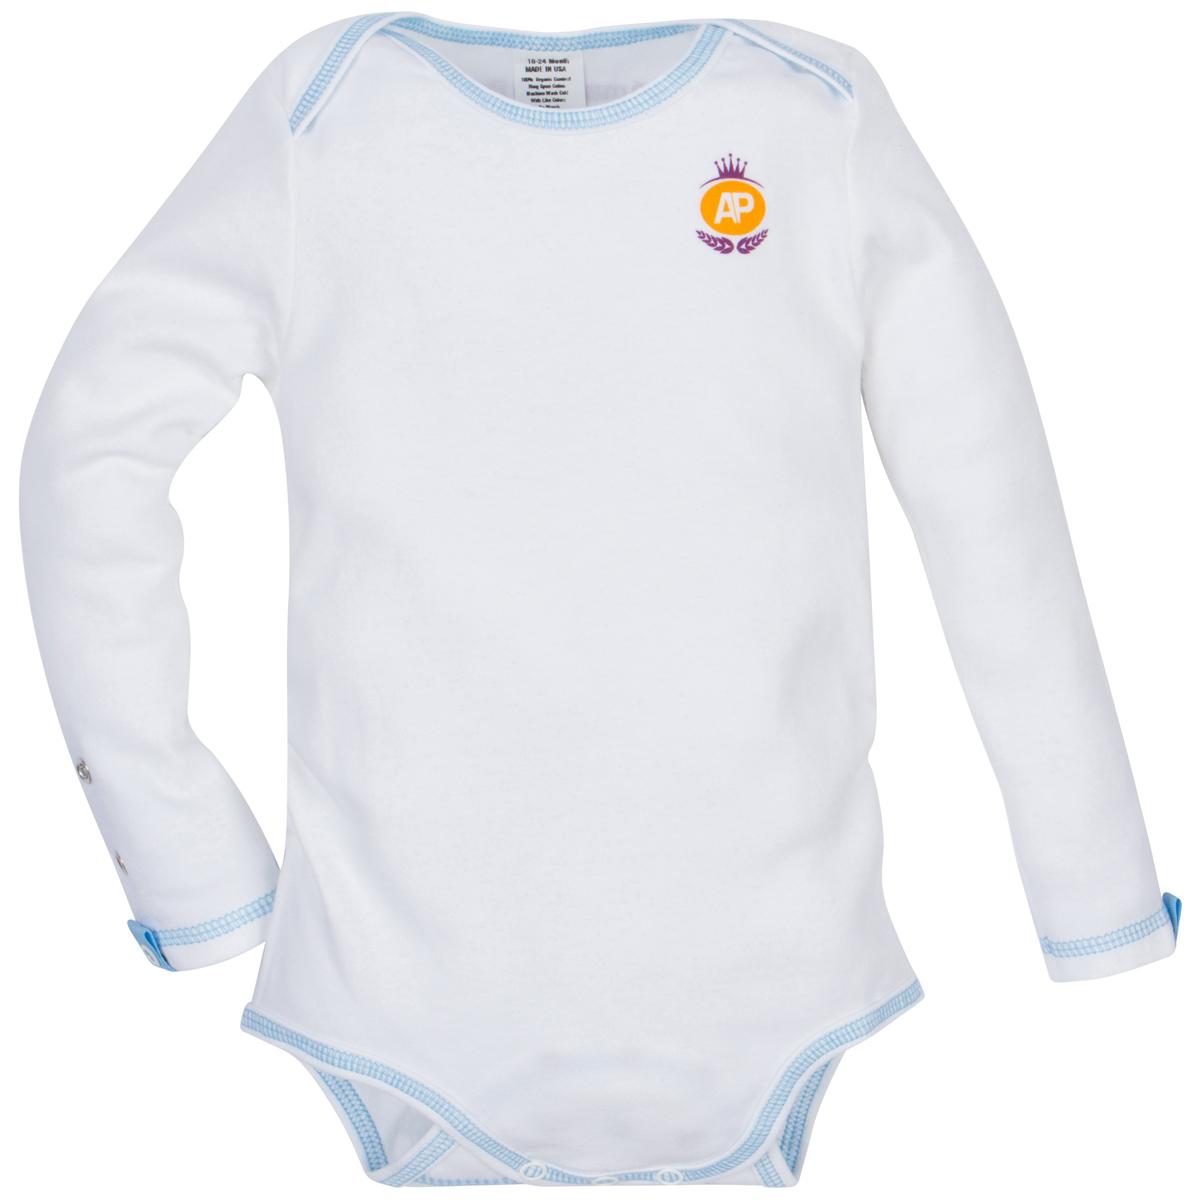 White with Blue Stitch Organic Adjustable Bodysuit Long-Sleeve